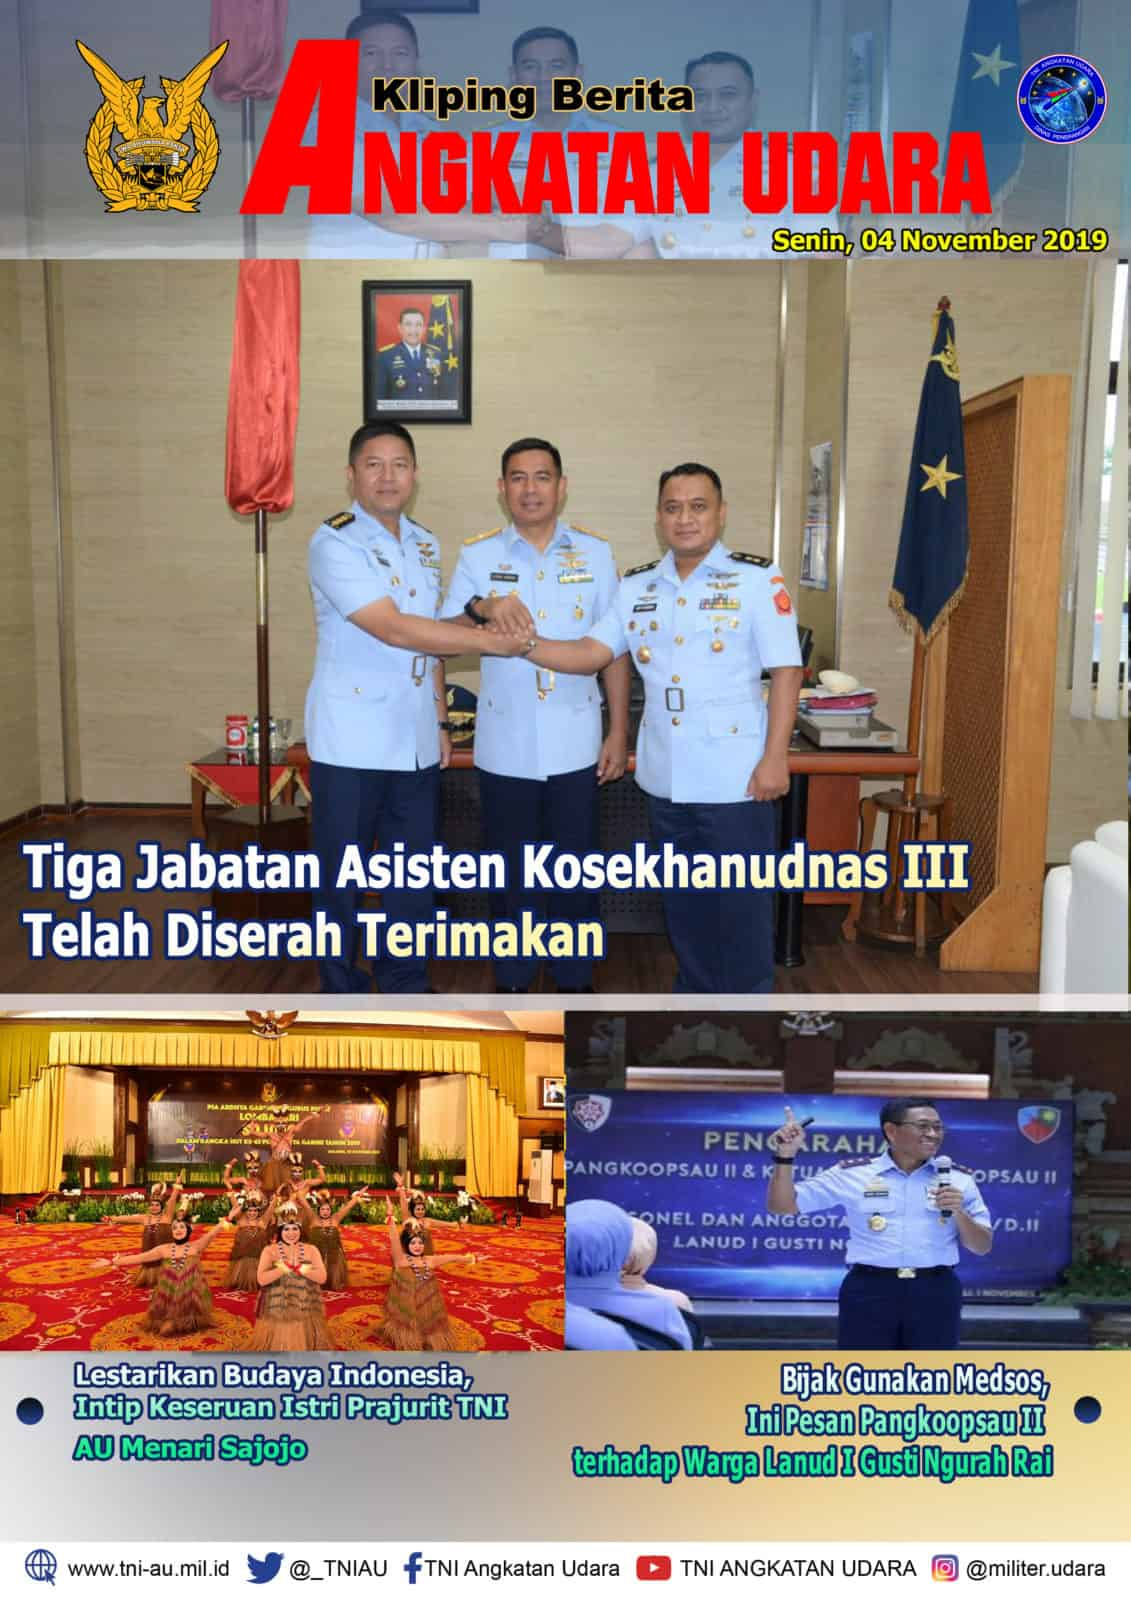 Kliping Berita Media 04 November 2019